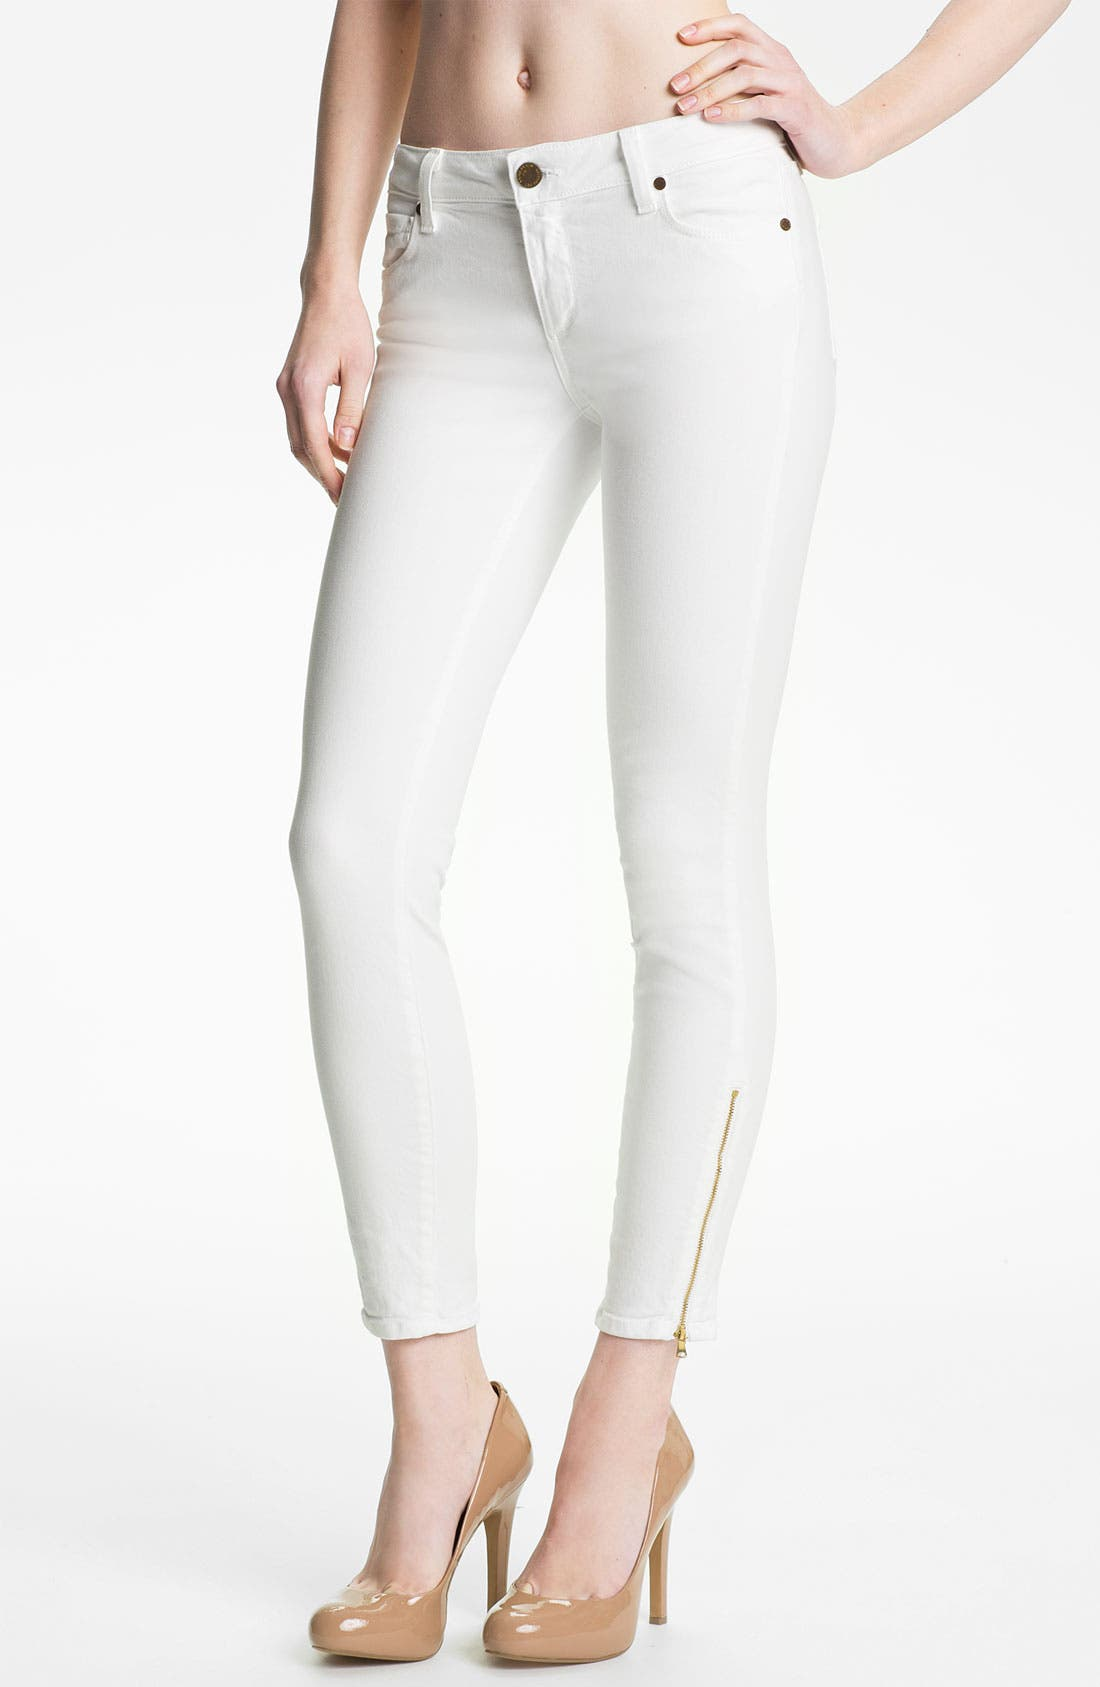 Main Image - Paige Denim 'Verdugo' Ankle Zip Skinny Stretch Jeans (White)